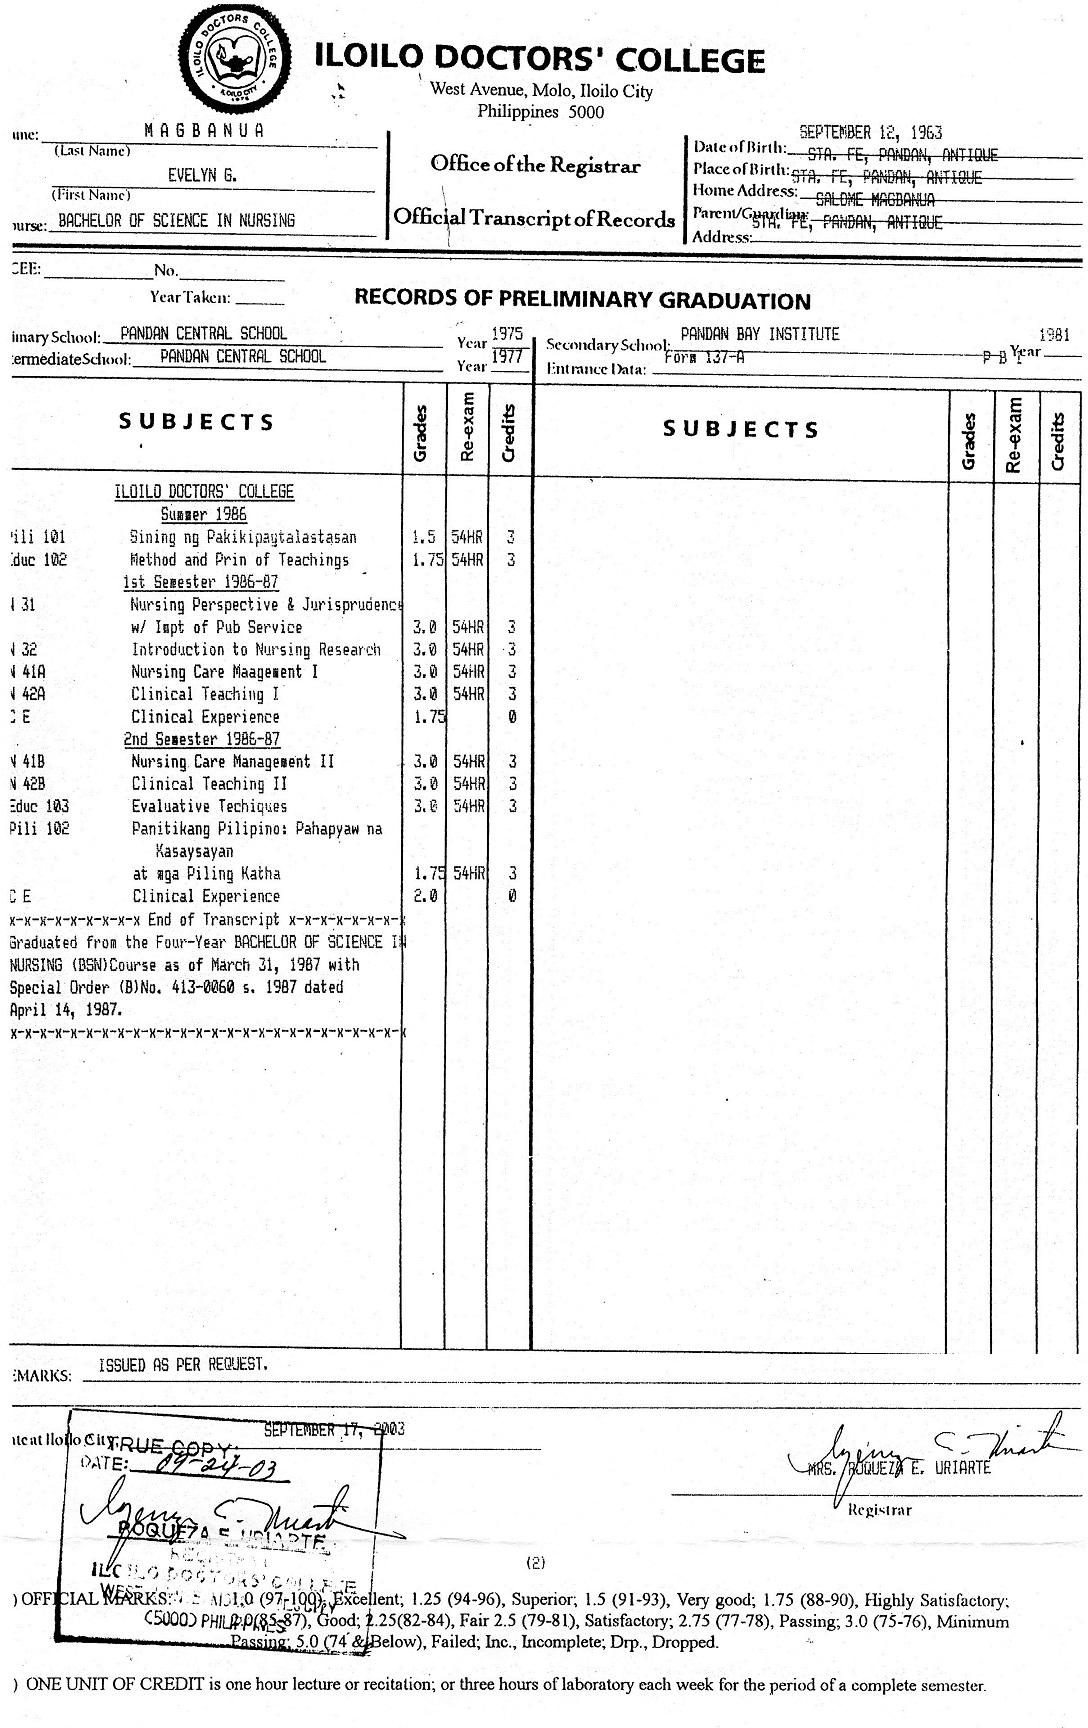 16. Board Certificate